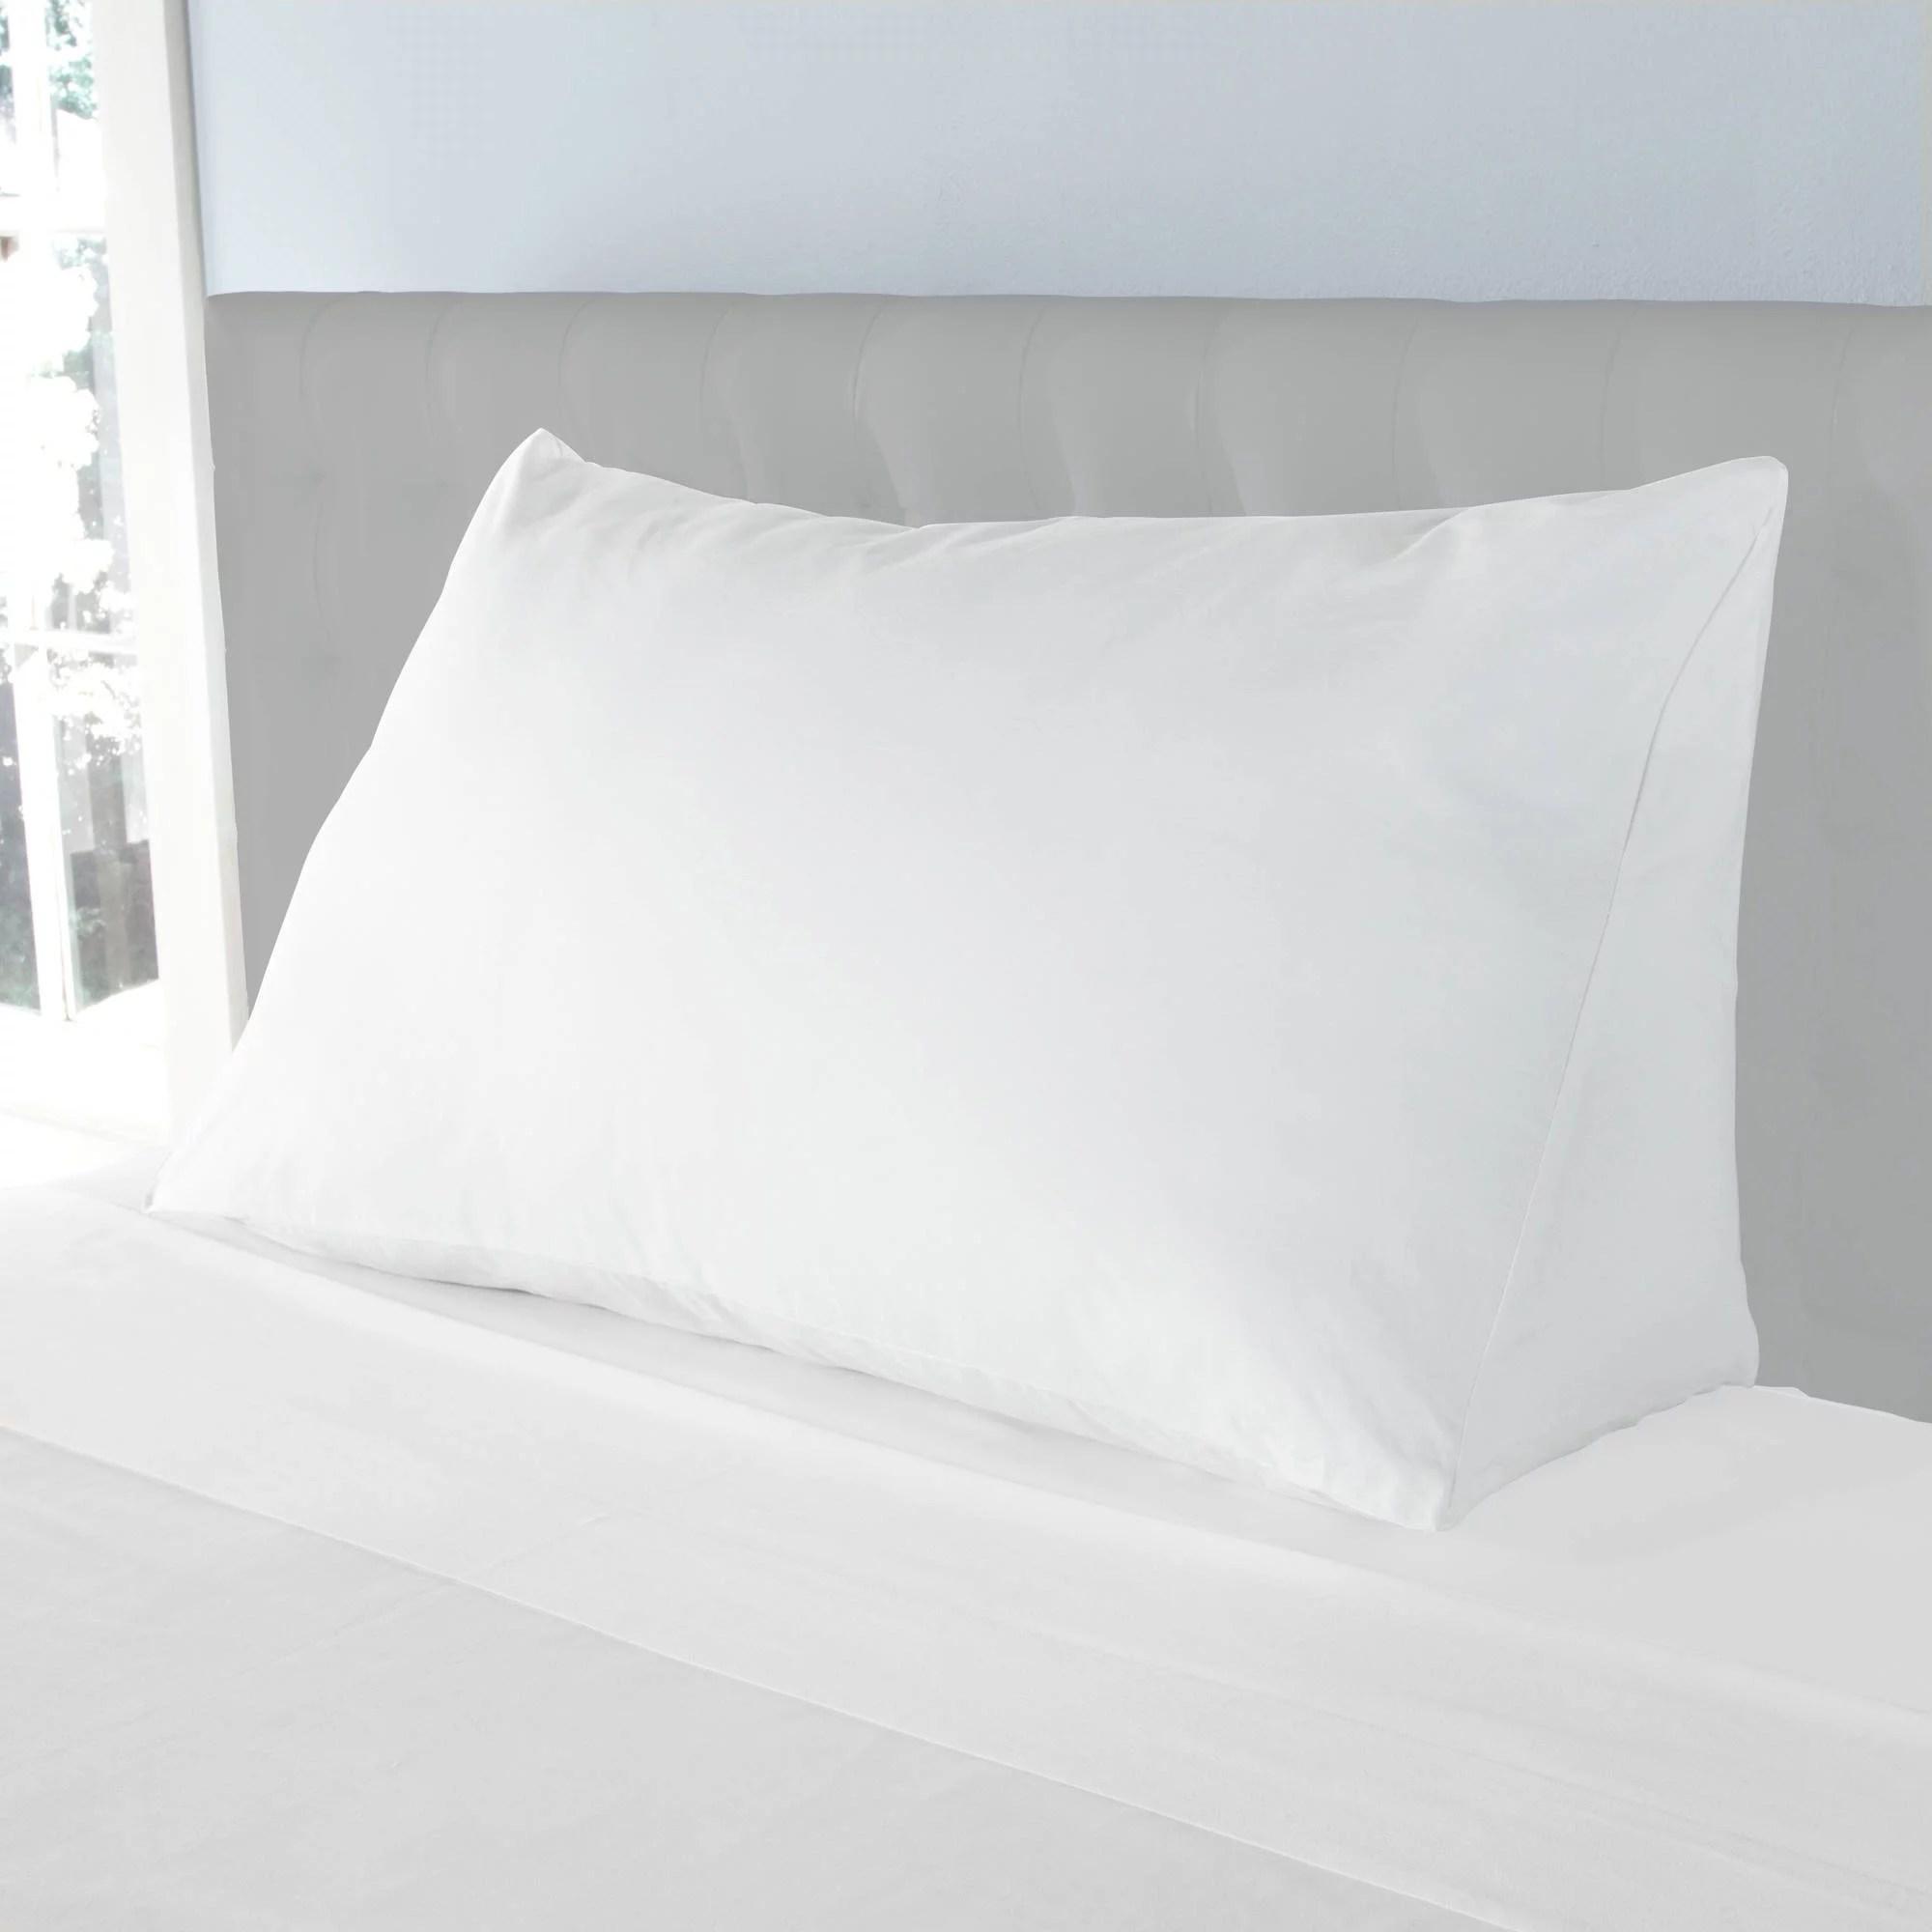 bed wedge foam pillow